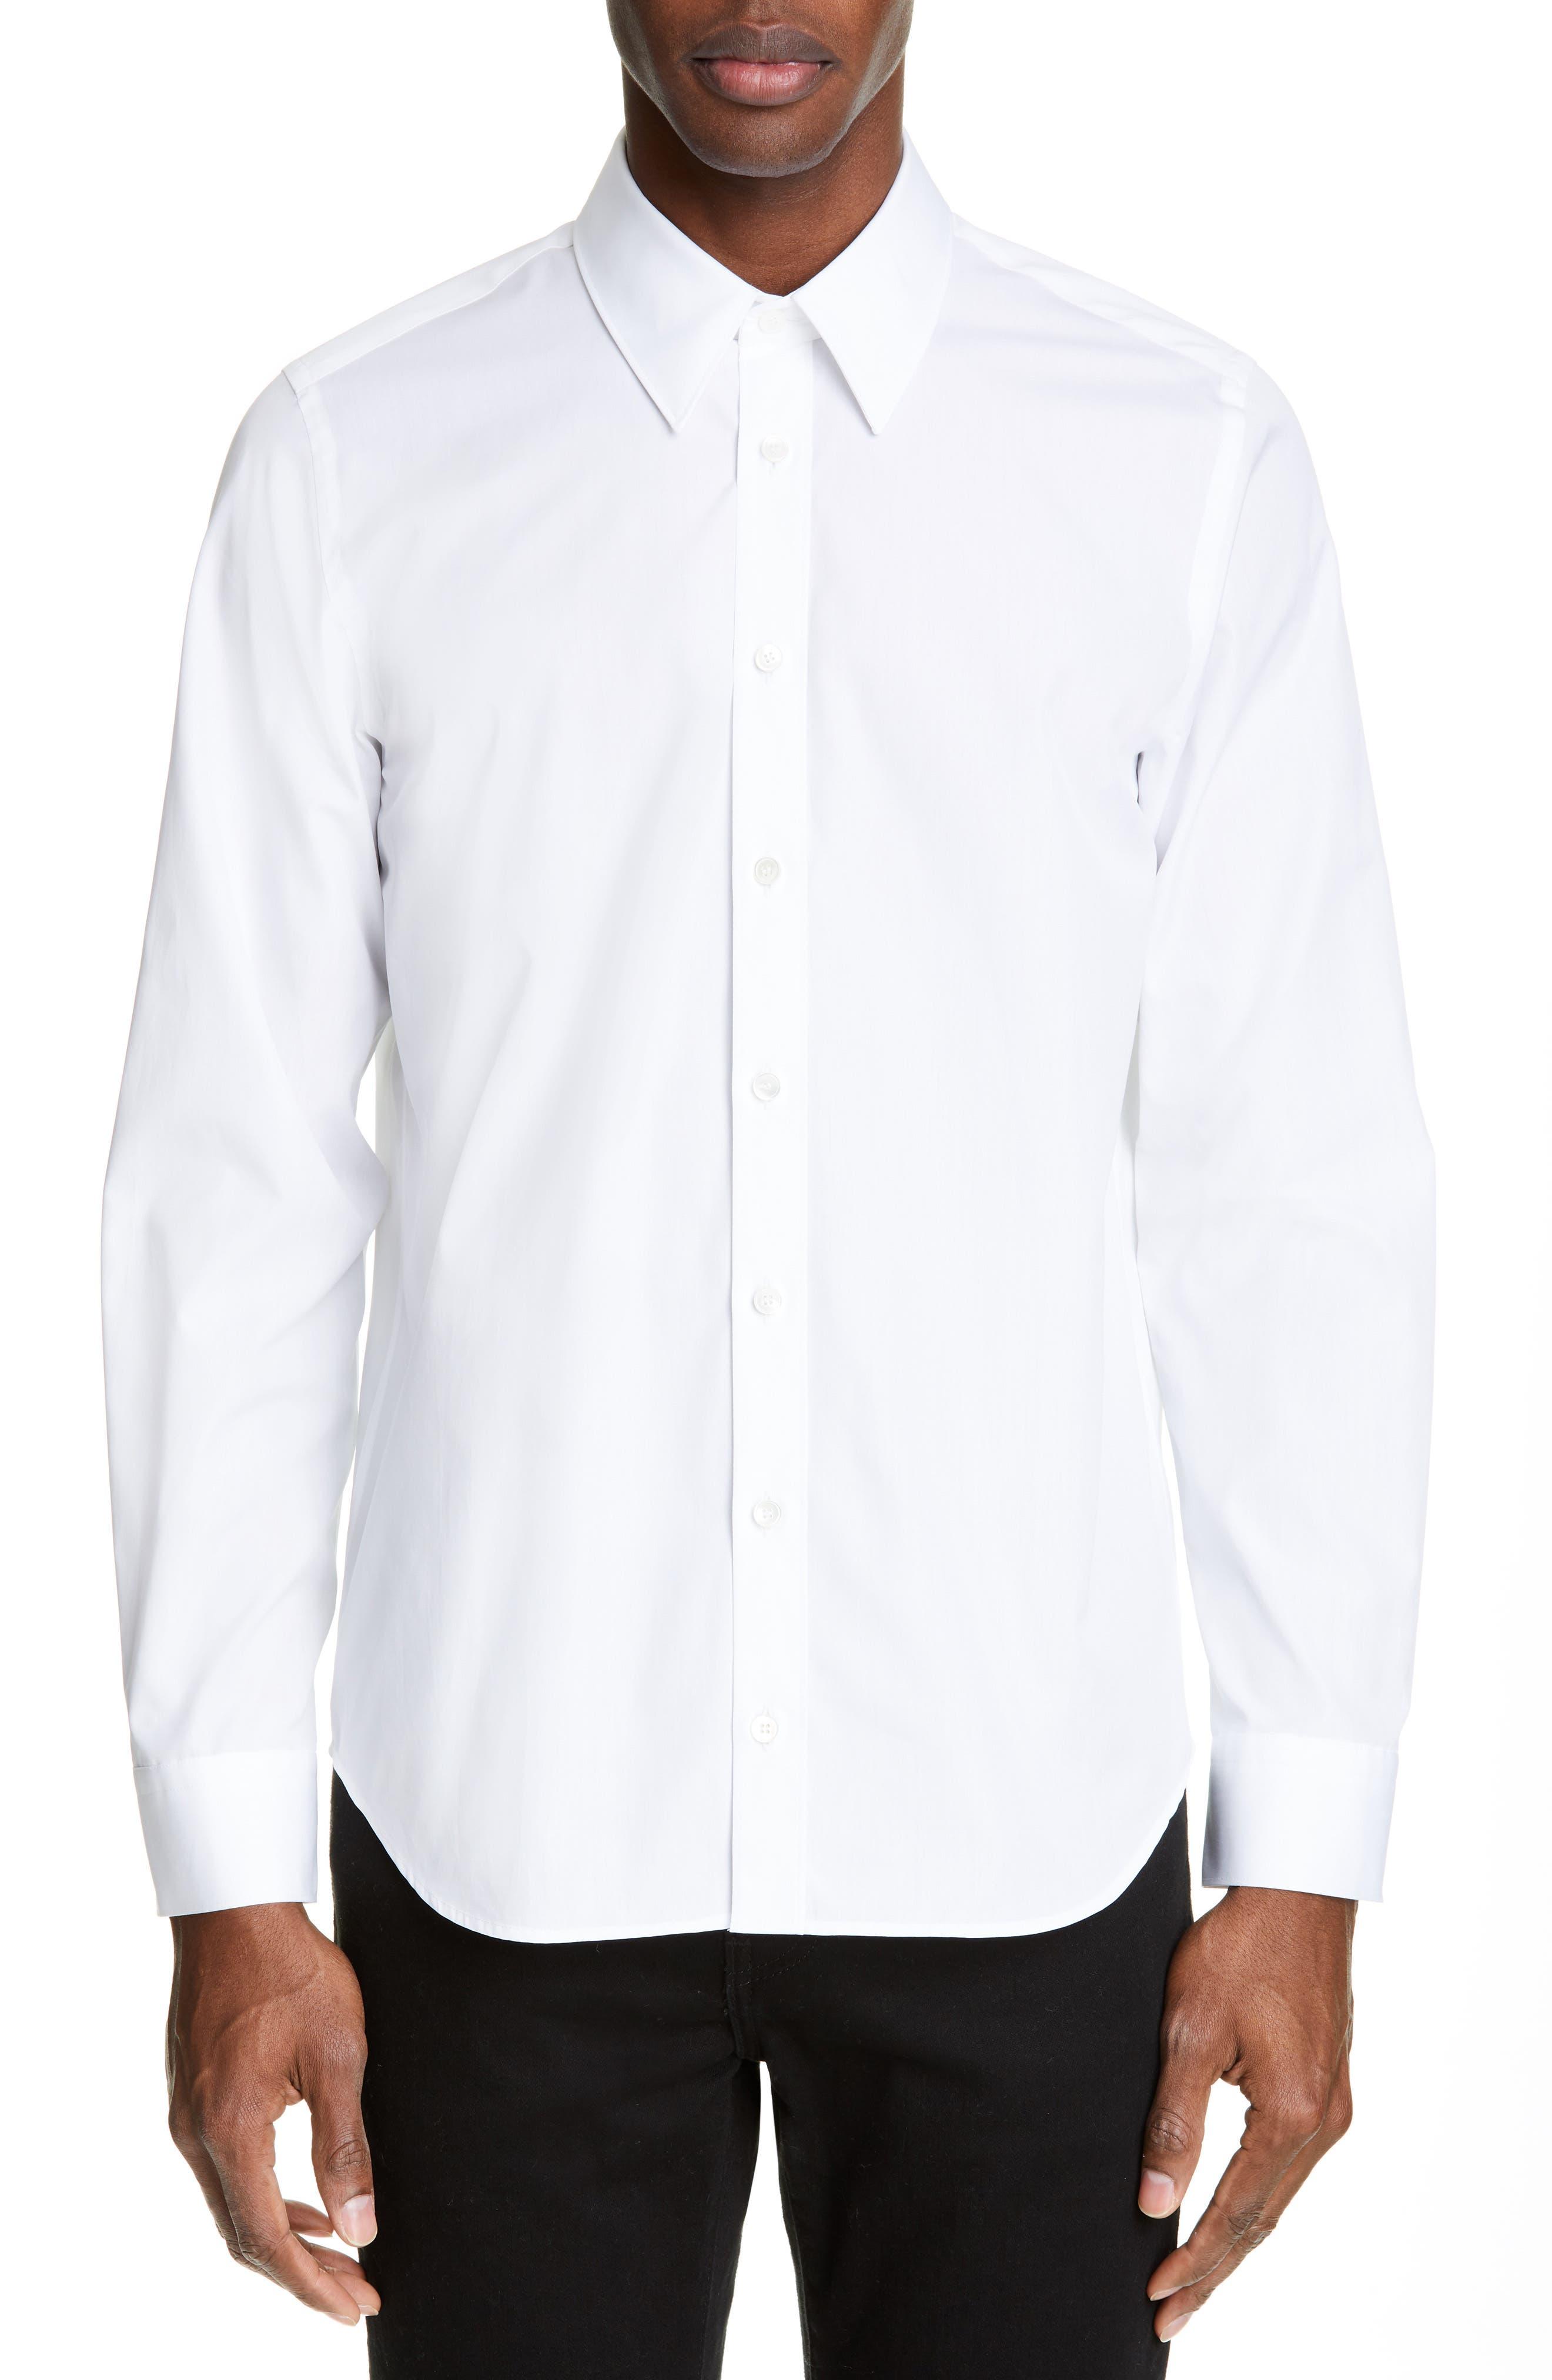 HELMUT LANG, Logo Print Dress Shirt, Main thumbnail 1, color, WHITE/SILVER